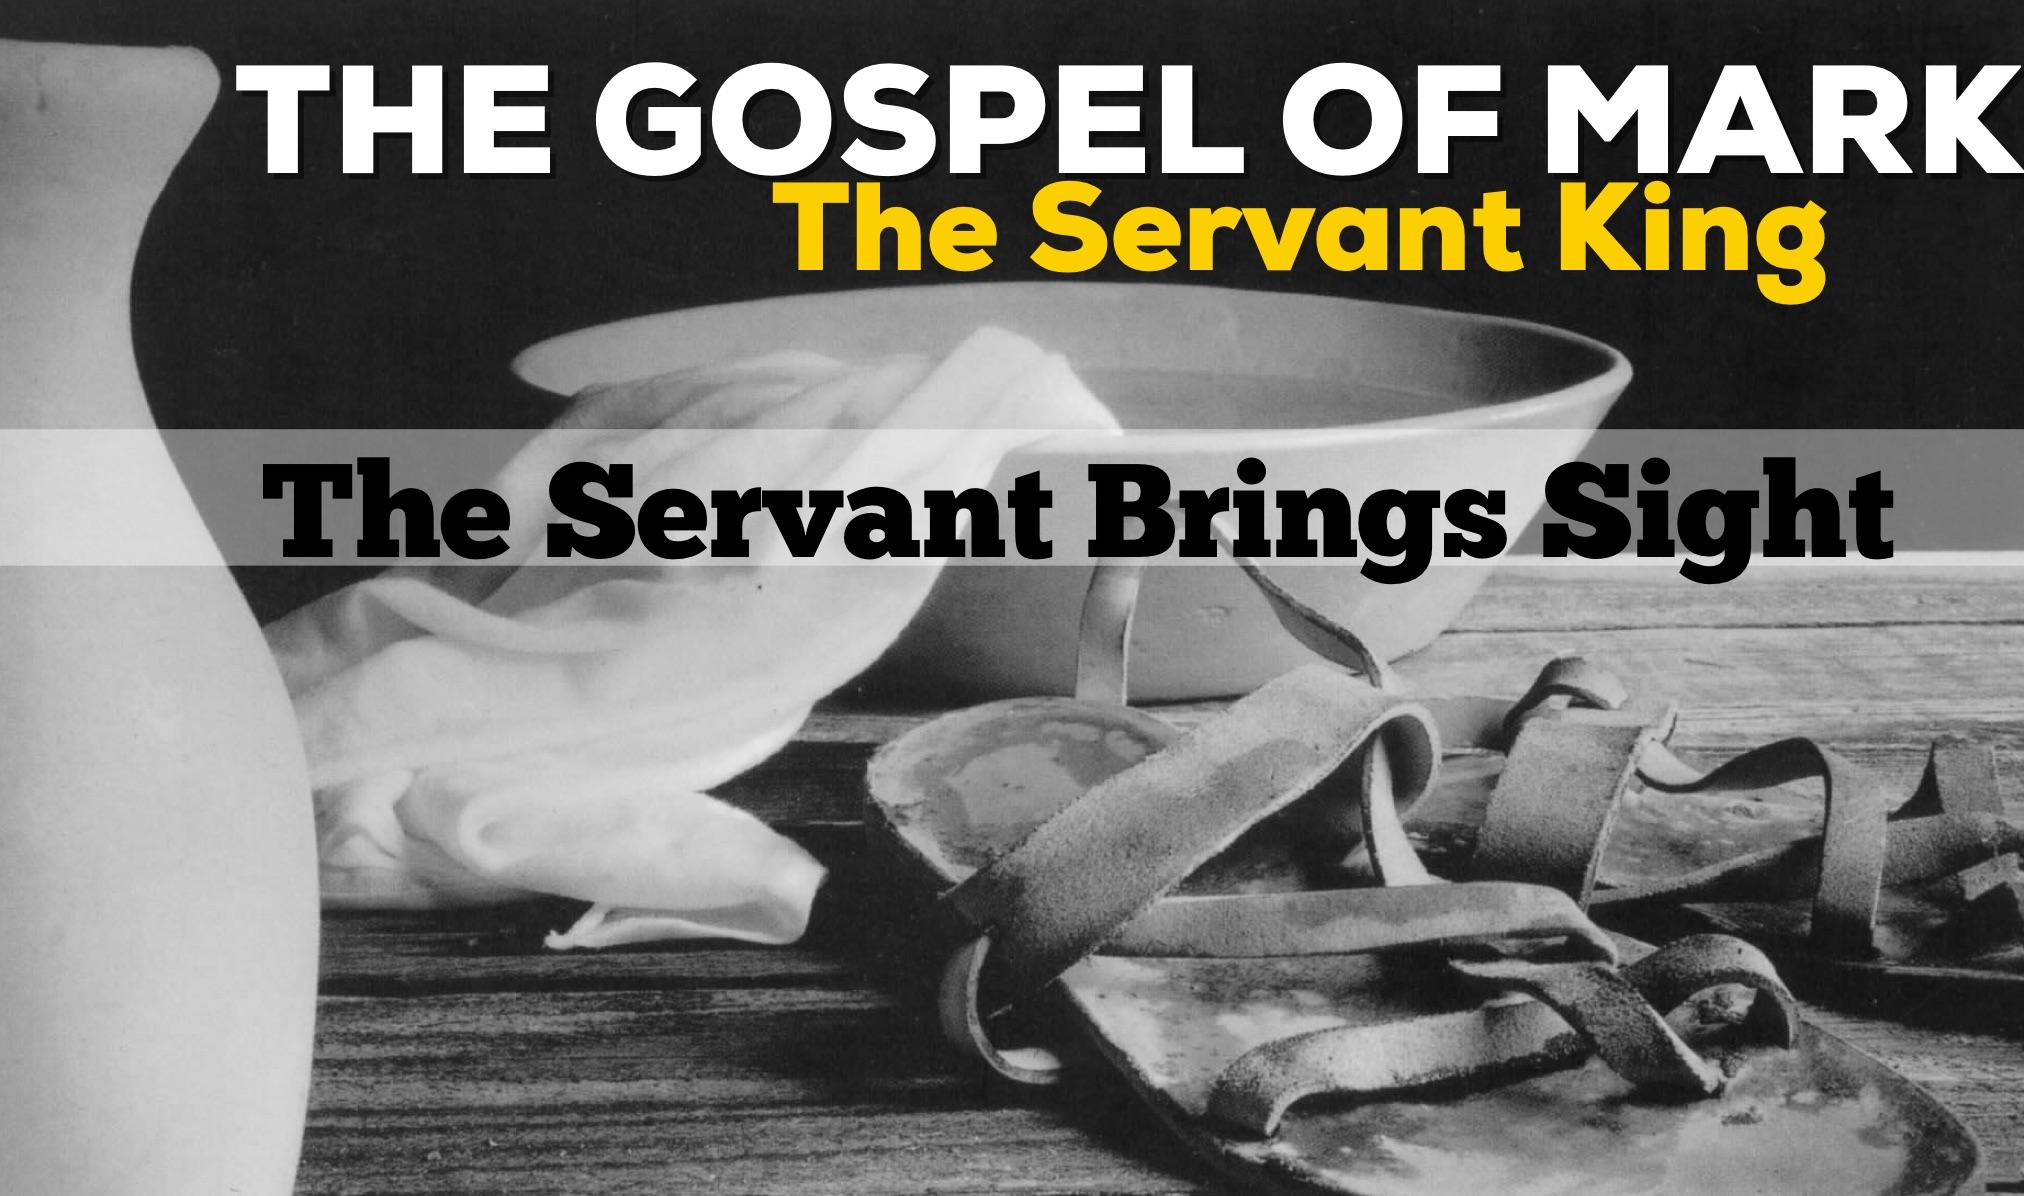 The Servant Brings Sight.jpg